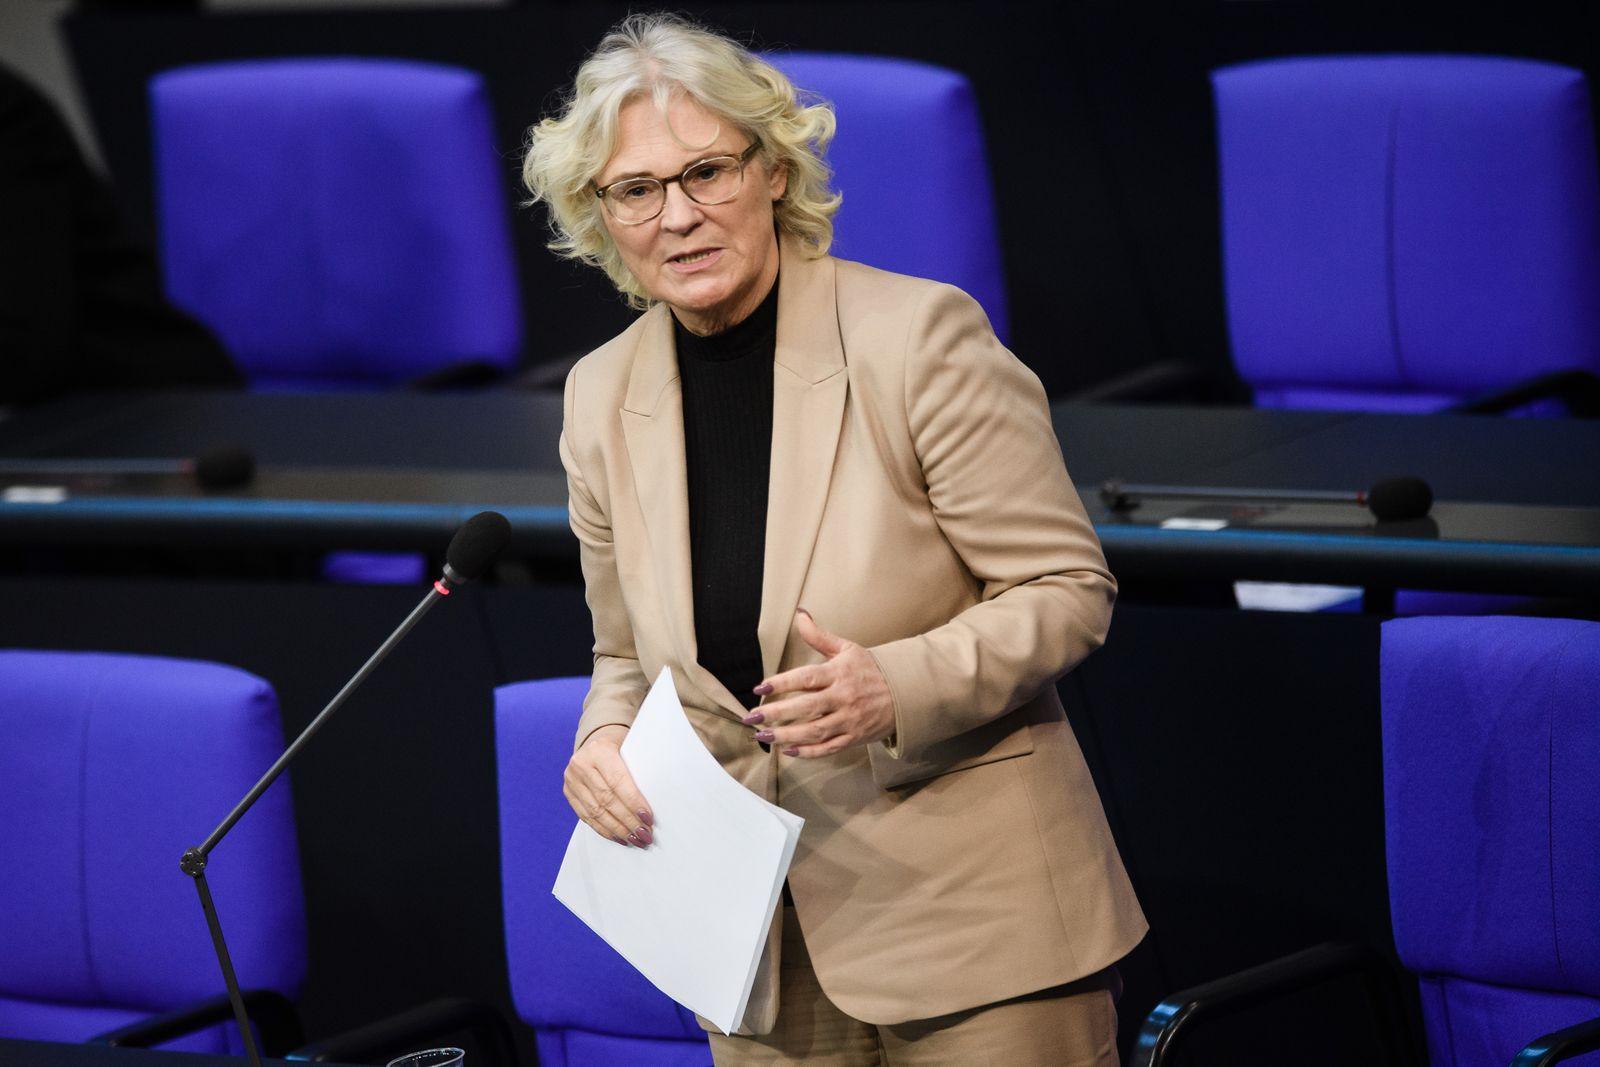 Question time at German parliament Bundestag, Berlin, Germany - 04 Nov 2020